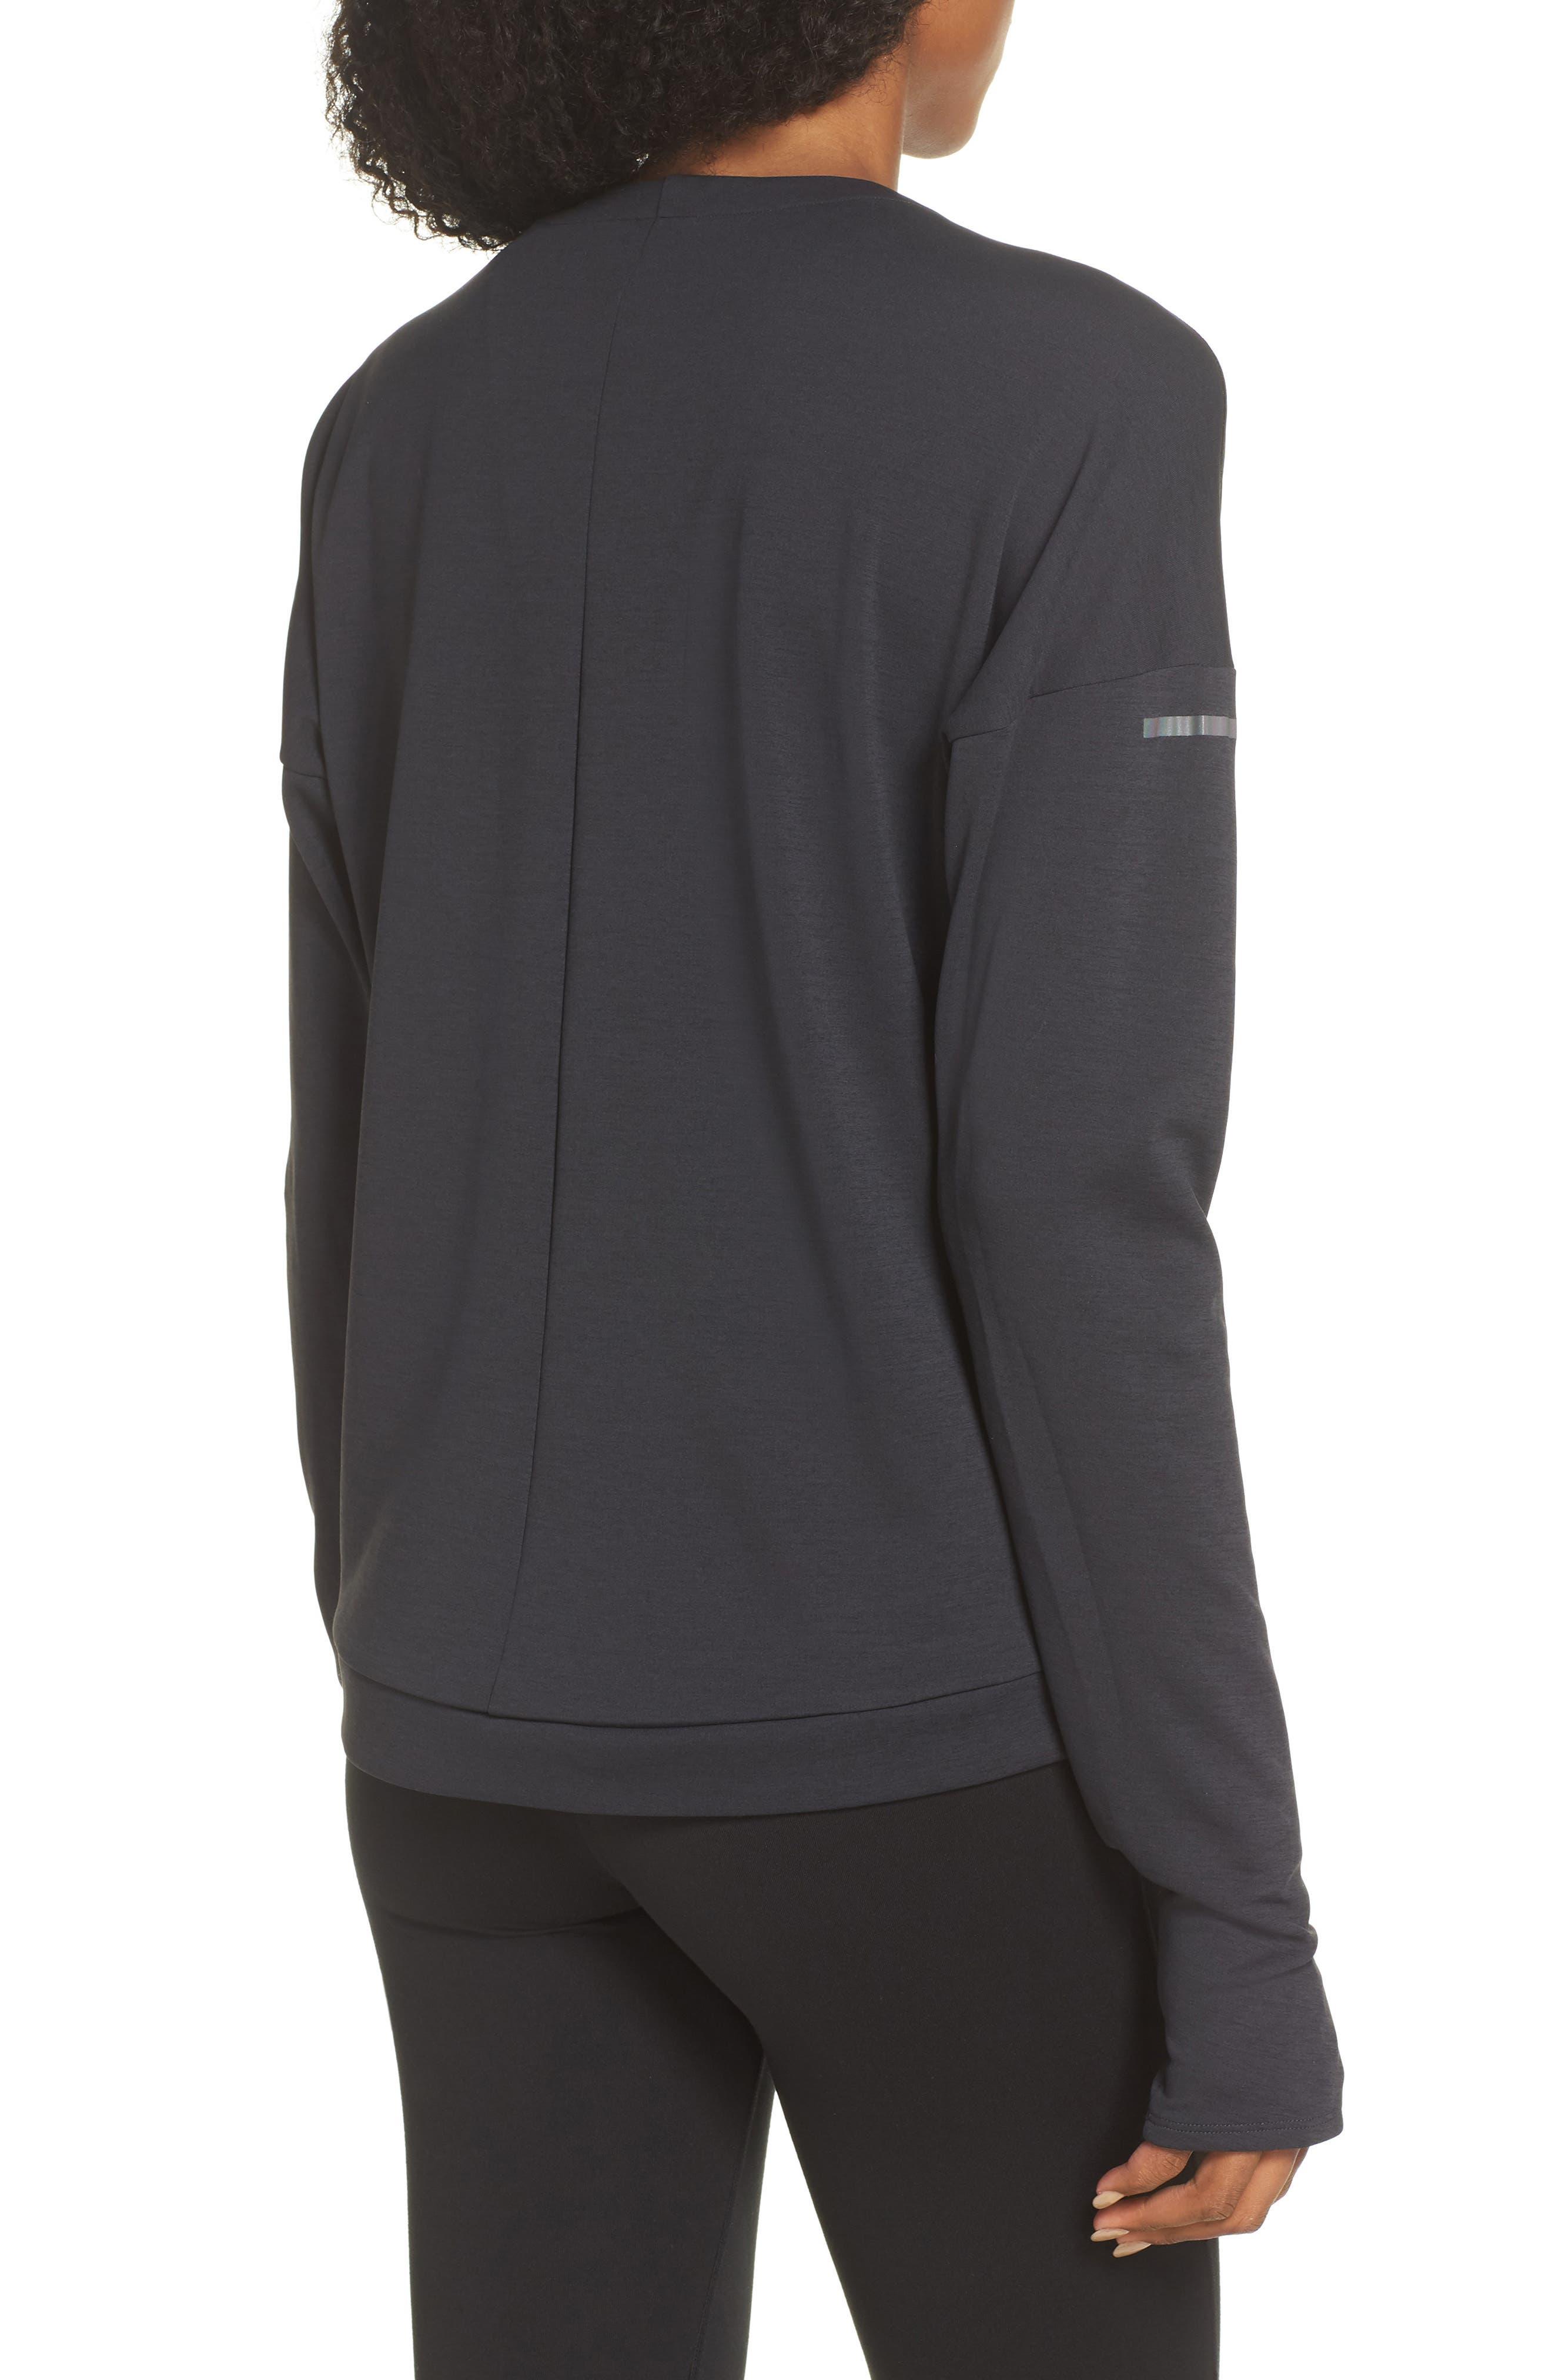 Supernova Run Sweatshirt,                             Alternate thumbnail 2, color,                             BLACK/ COLORED HEATHER